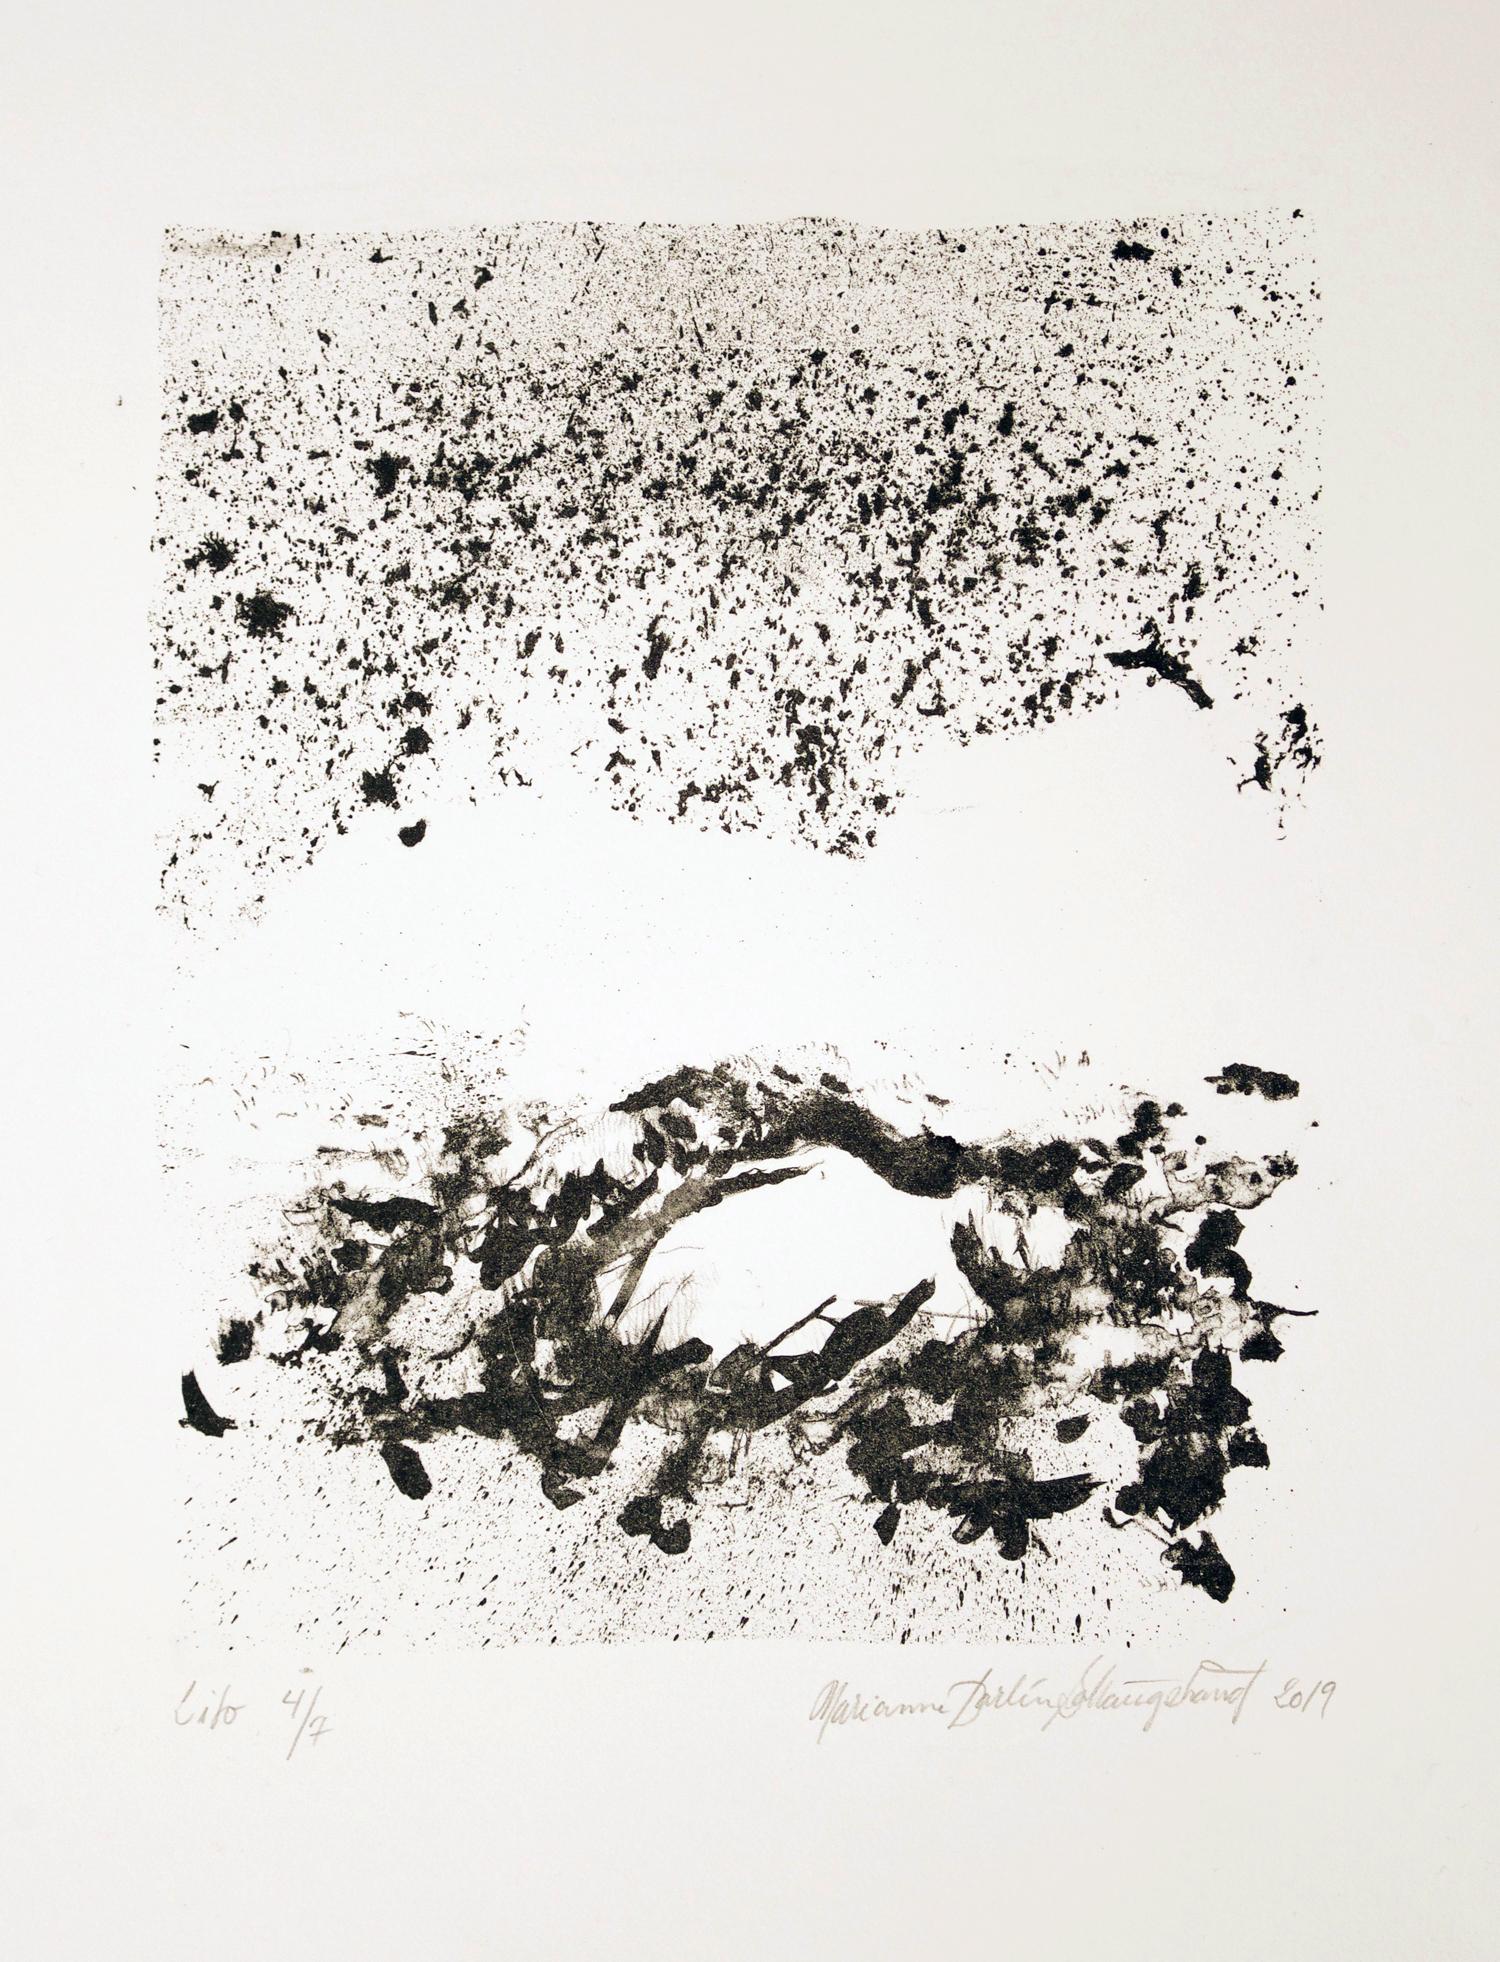 Litografi Solhaugstrand 2019